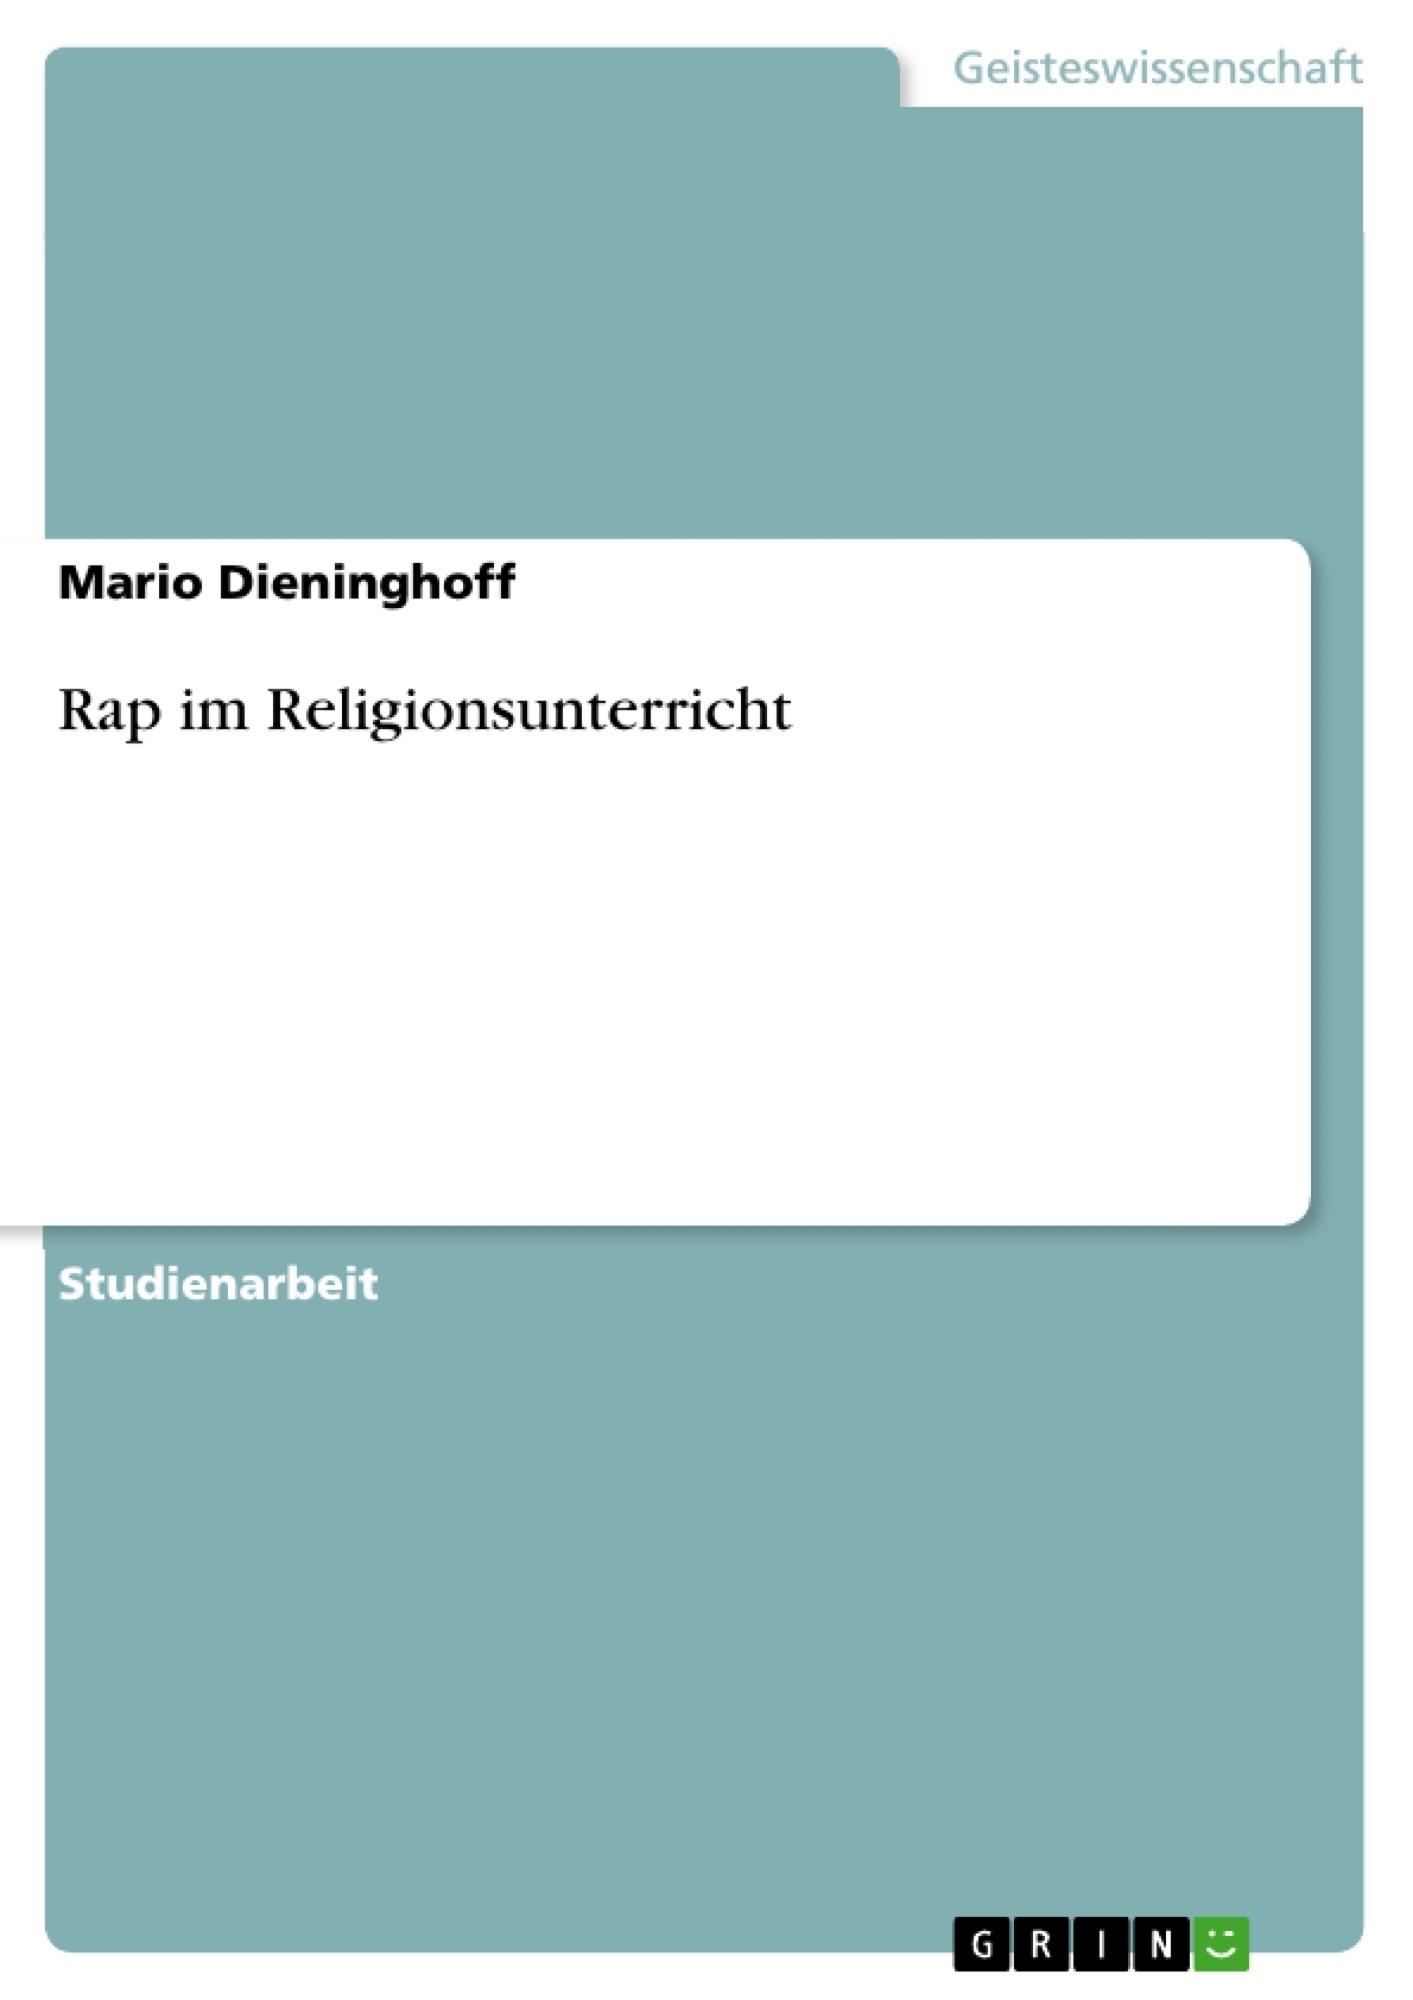 Titel: Rap im Religionsunterricht